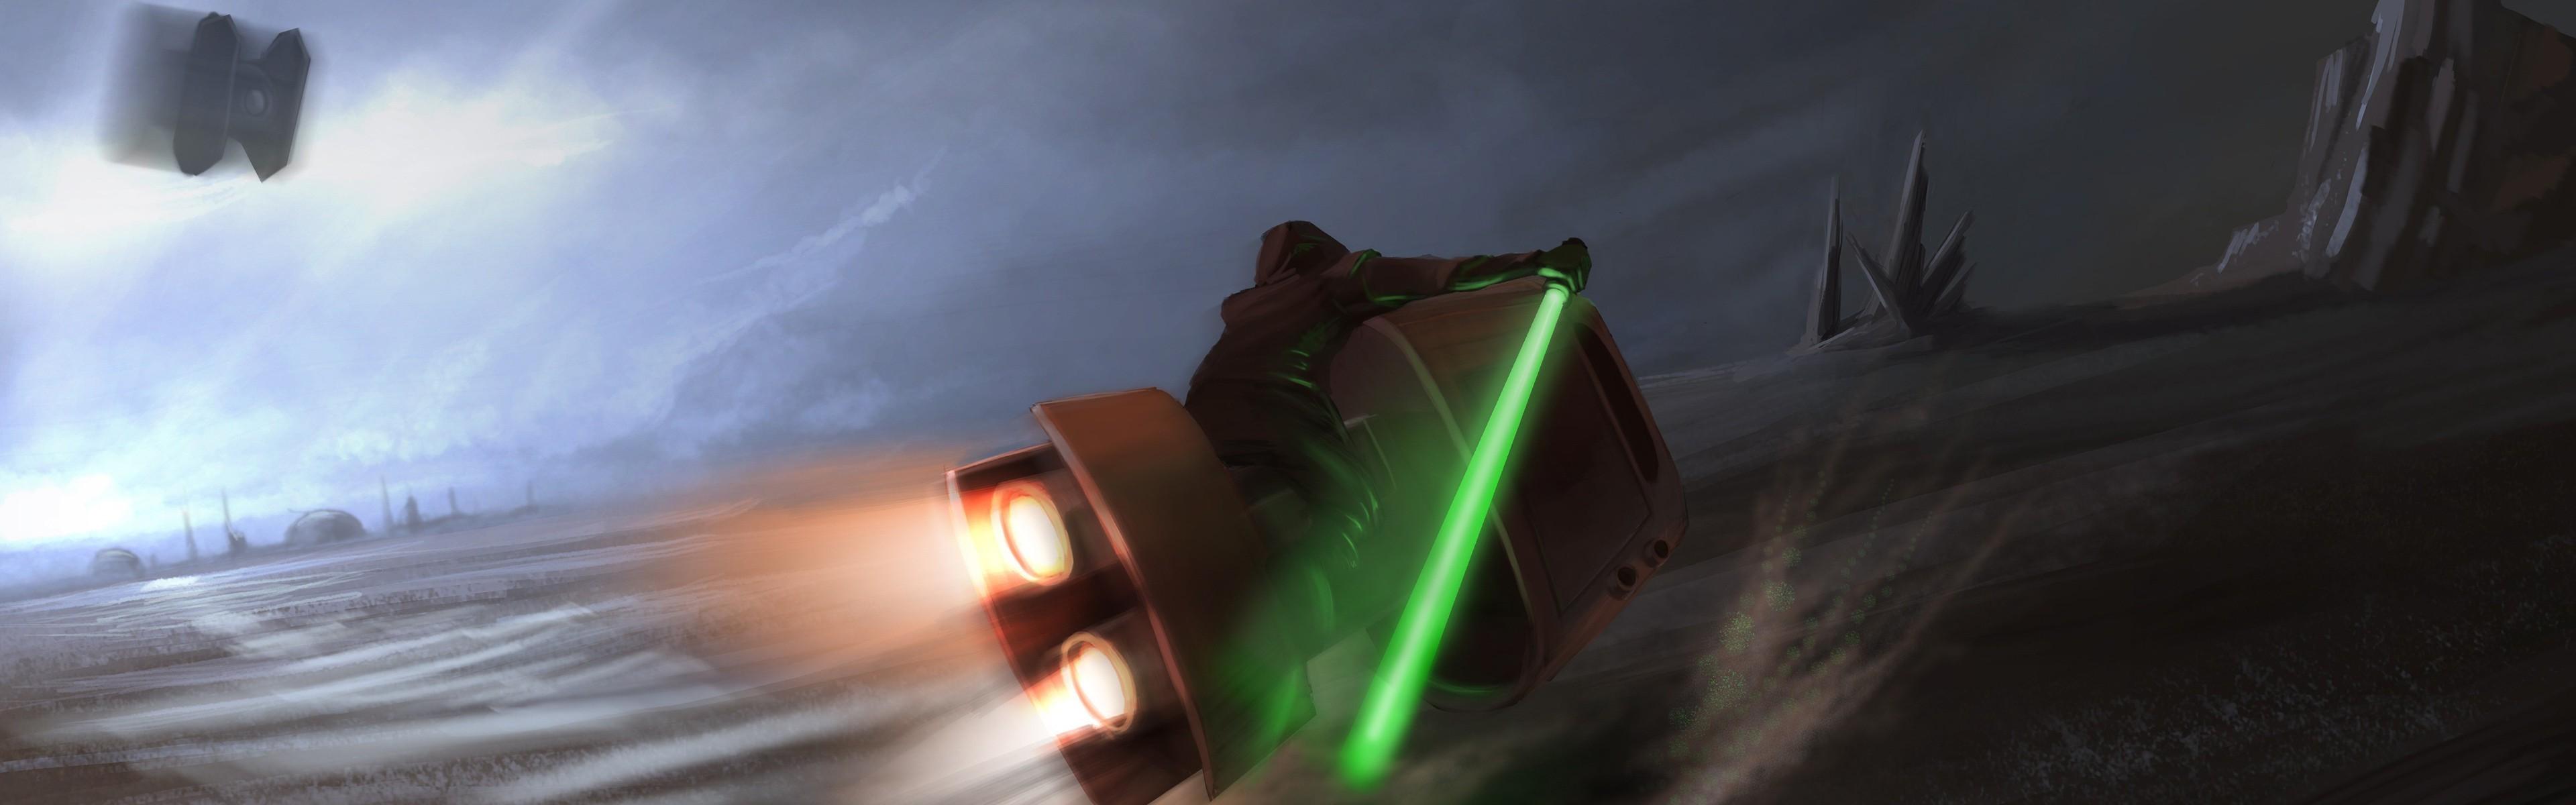 Star Wars Dual Monitor wallpaper ·① Download free HD